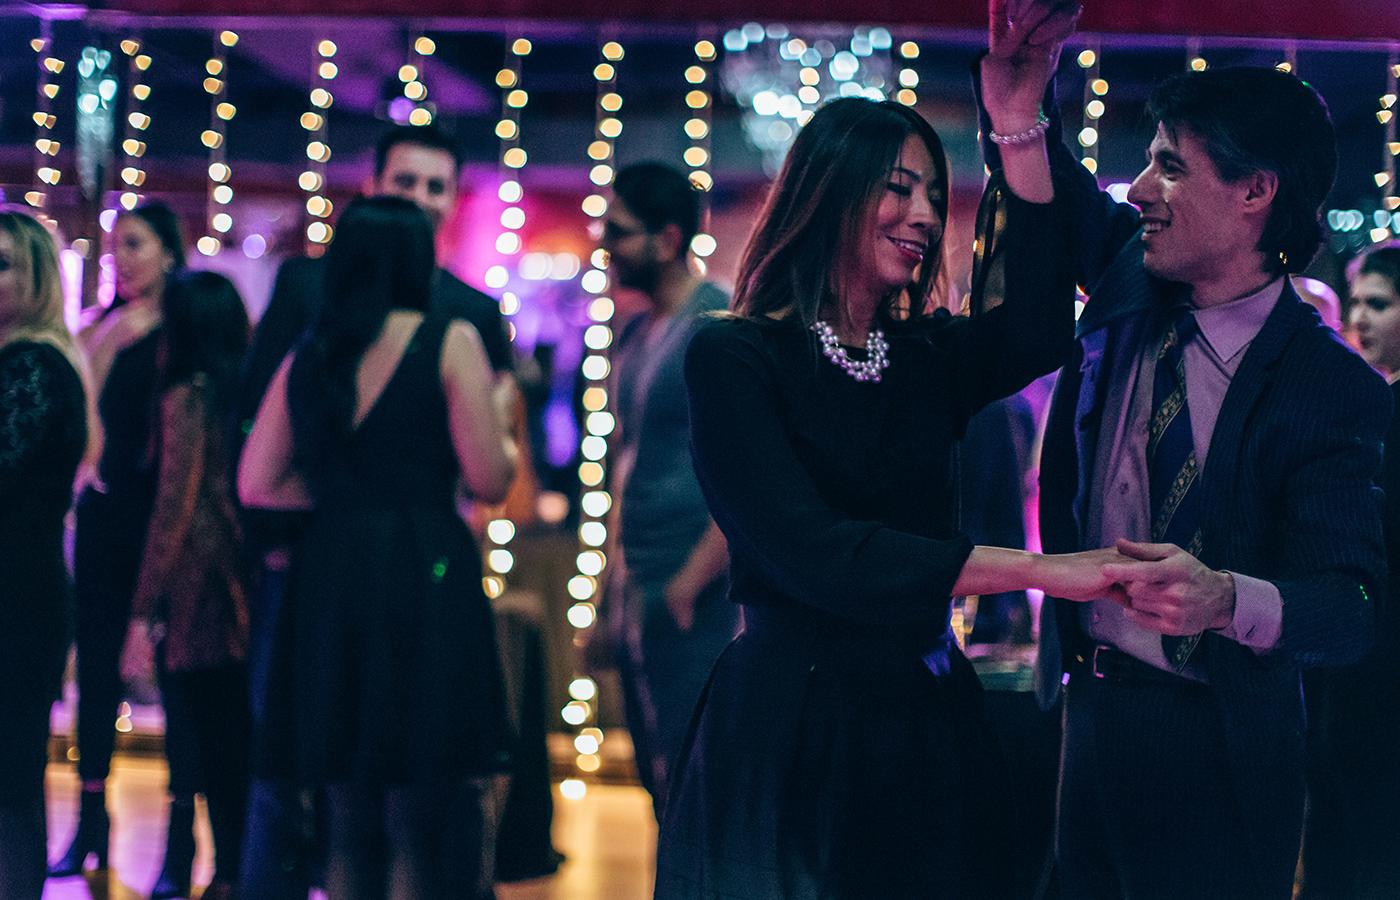 couple-dancing-why-we-dance.jpg